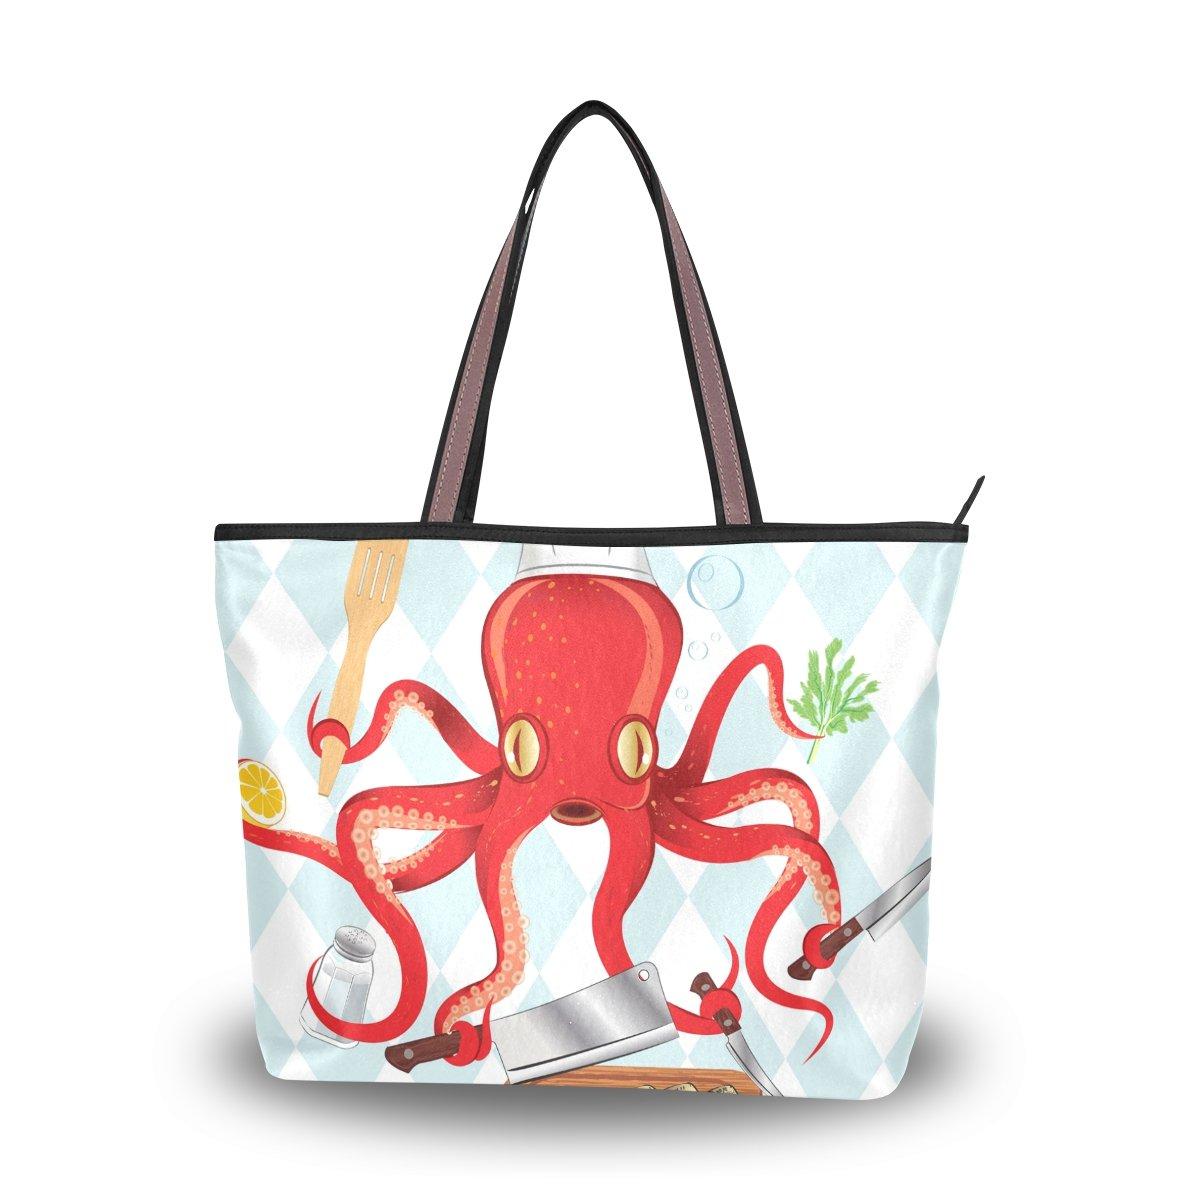 imobaby Octopus Cooking Sushi And Fish Women Large Tote Shoulder BagsTop Handle Handbag TE064